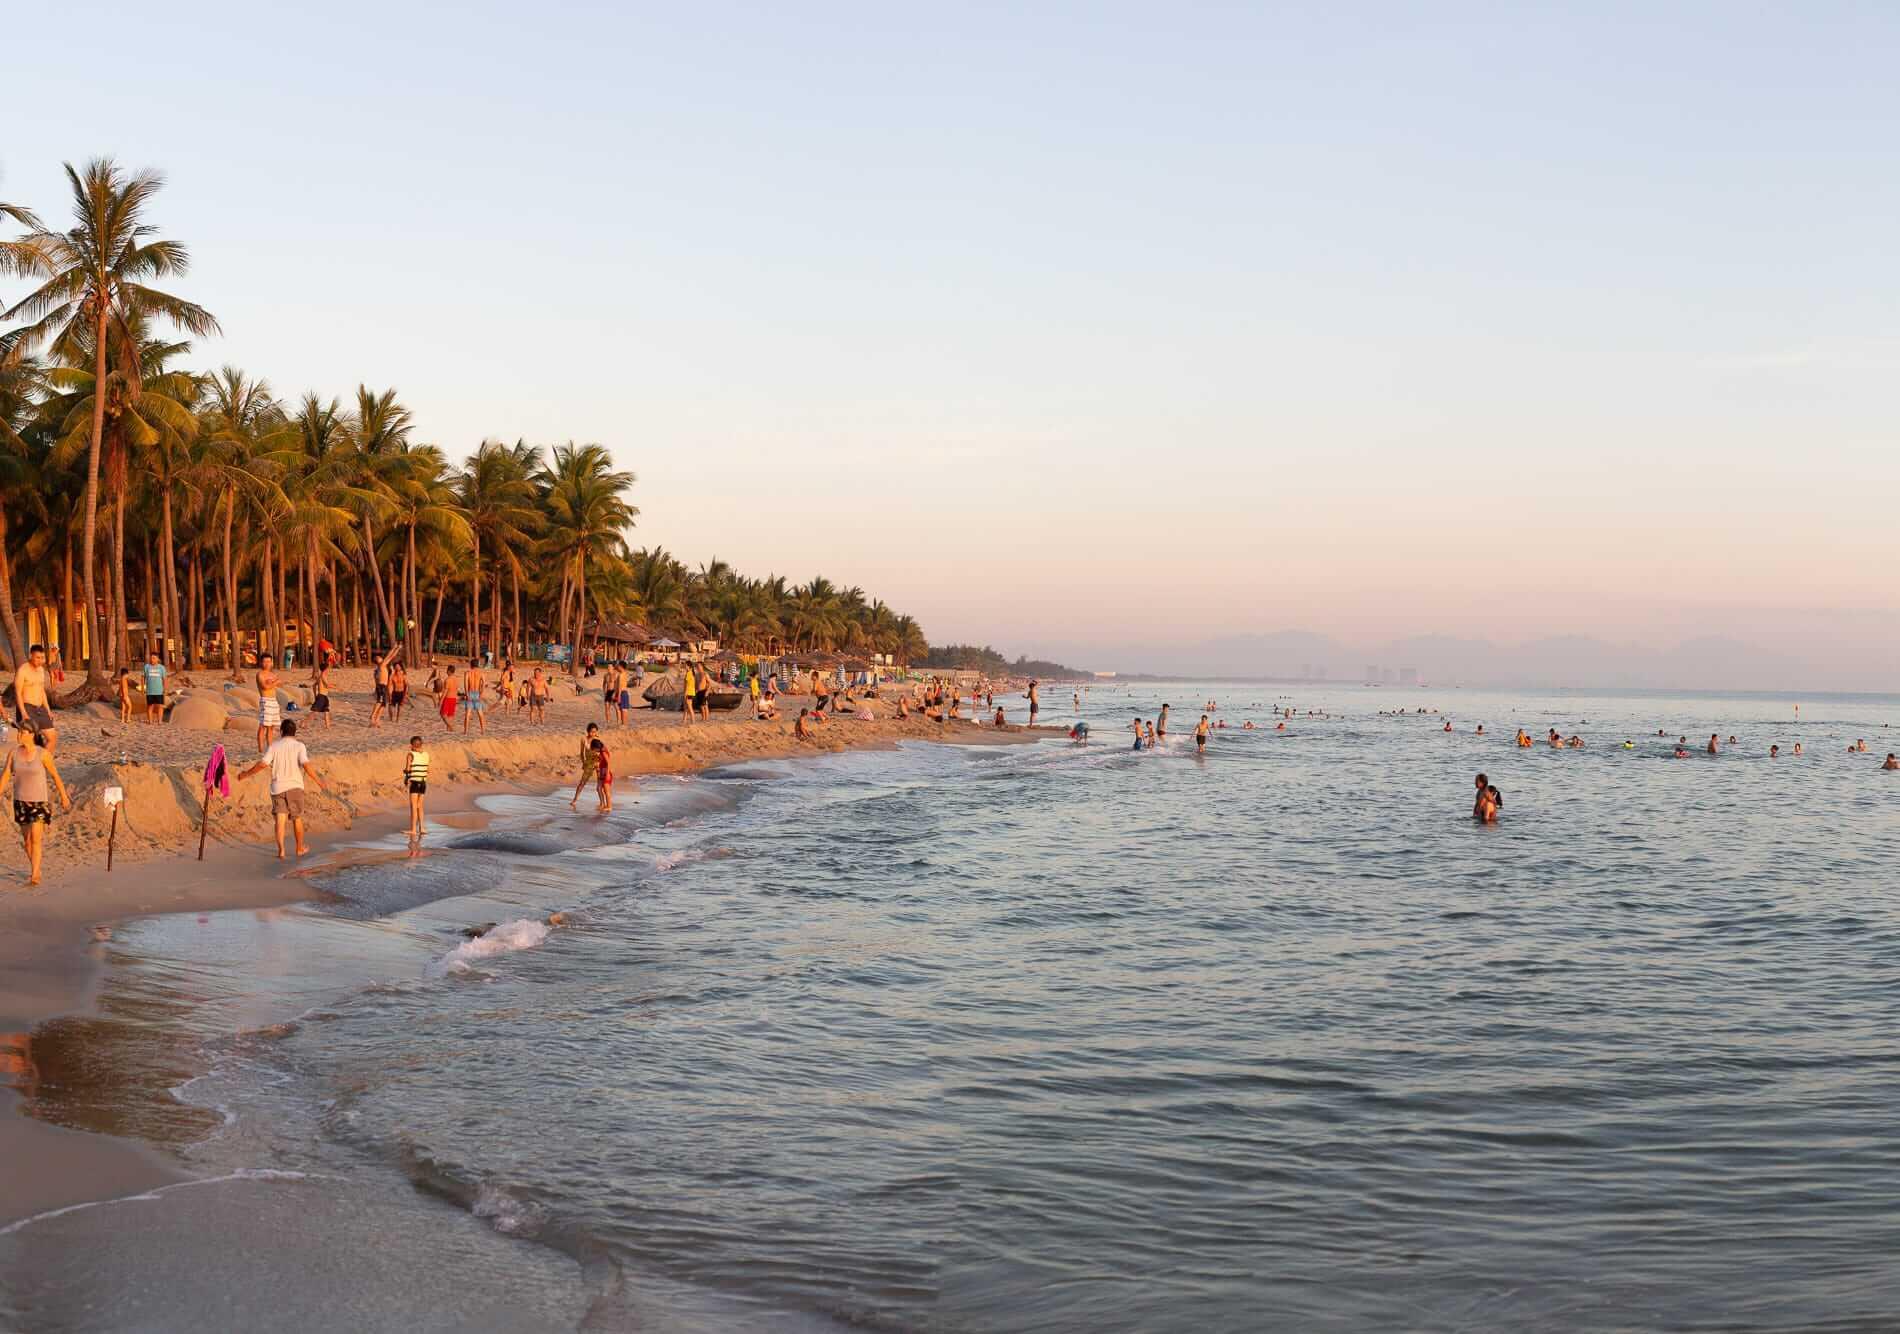 Hoi An's beach in the glow of sunrise.